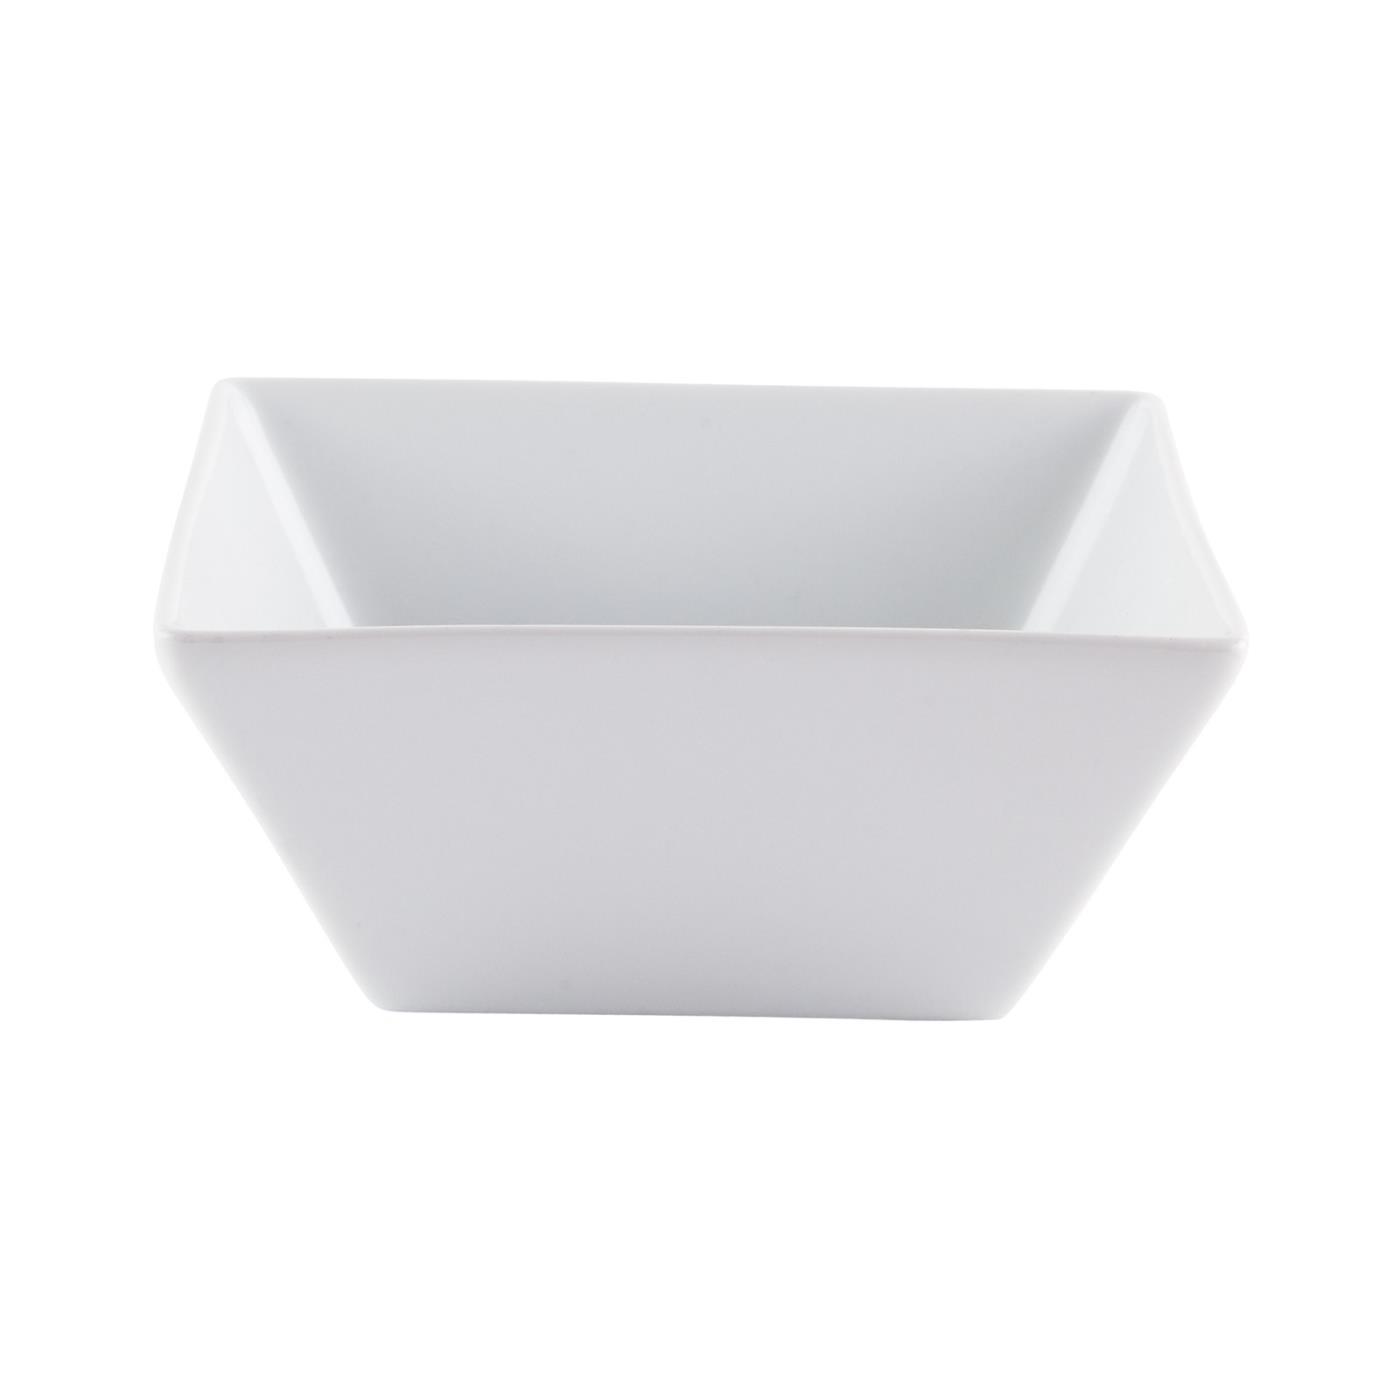 "White Ceramic Square Bowl - 6"" Deep"